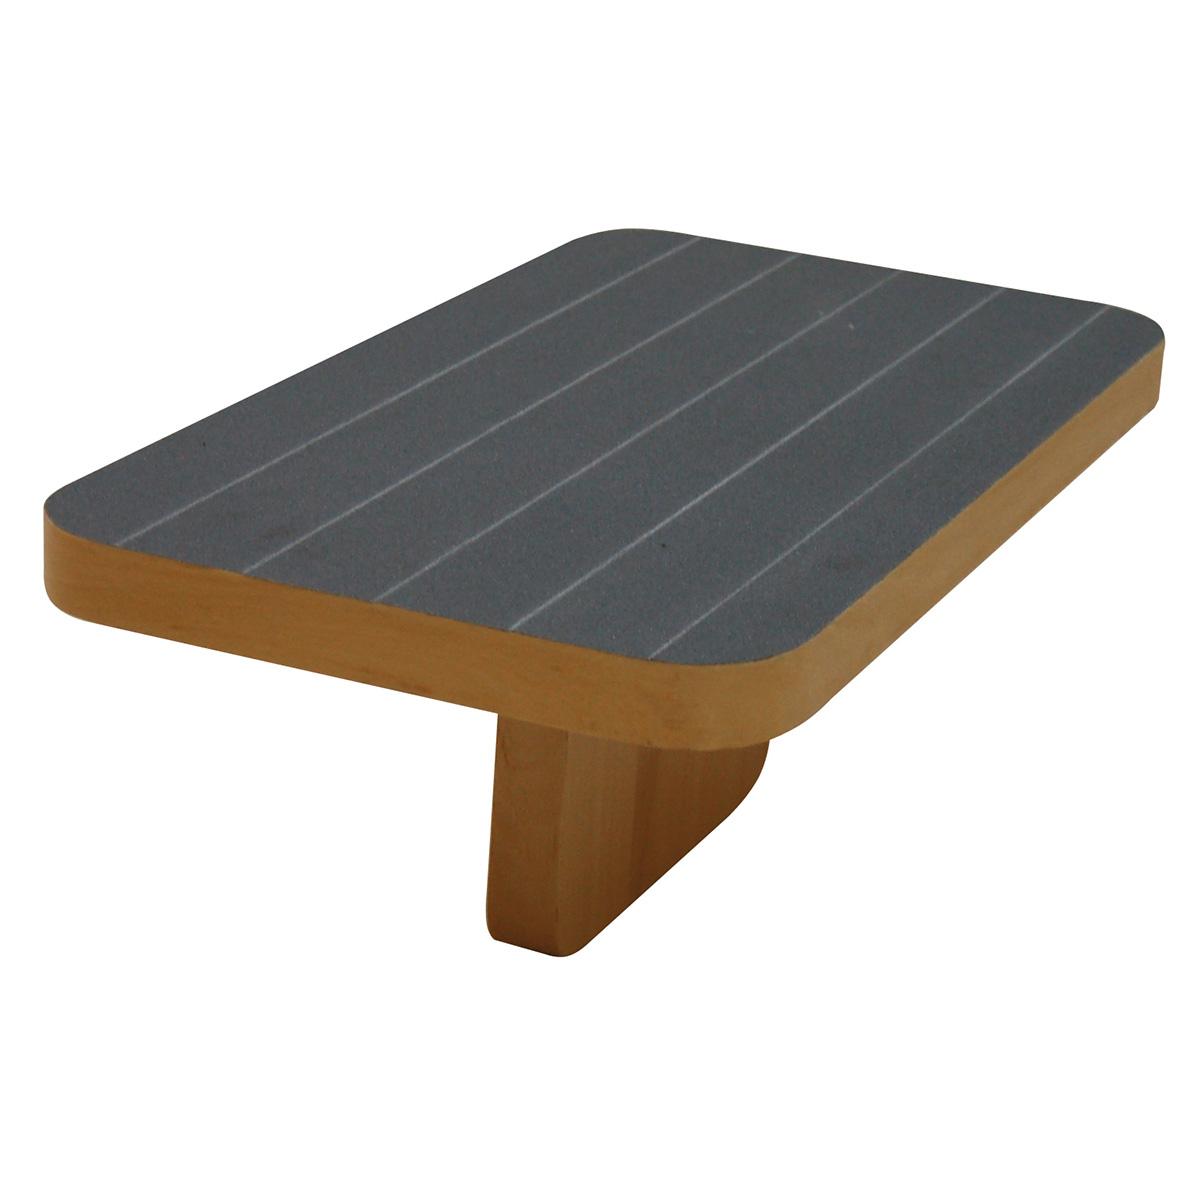 Pilates Reformer Platform